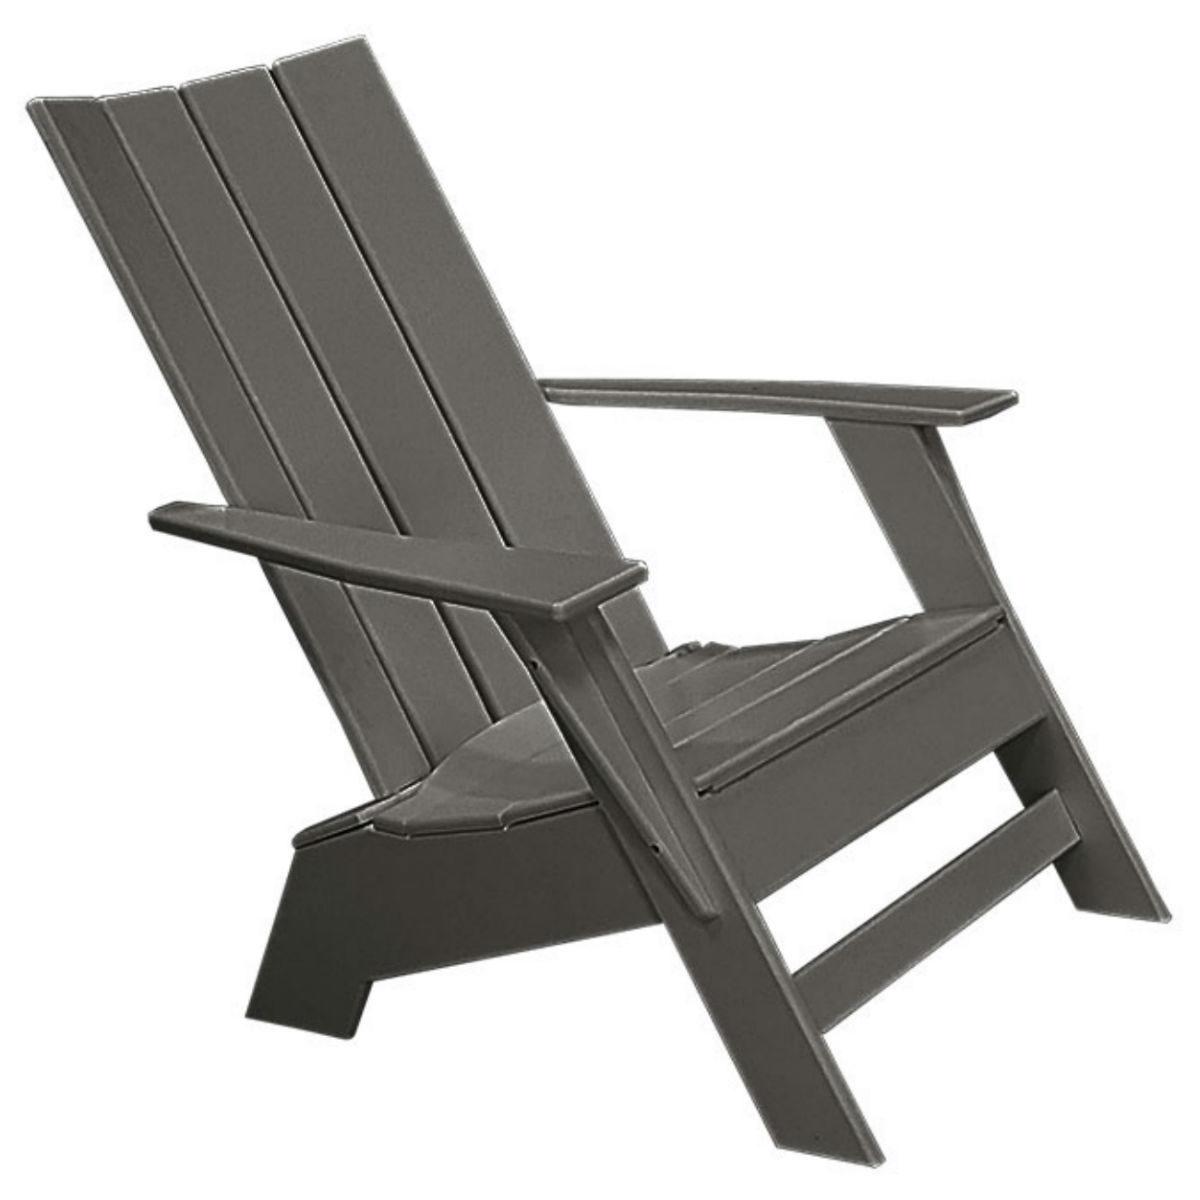 Modern Muskoka Chair Recycled Patio